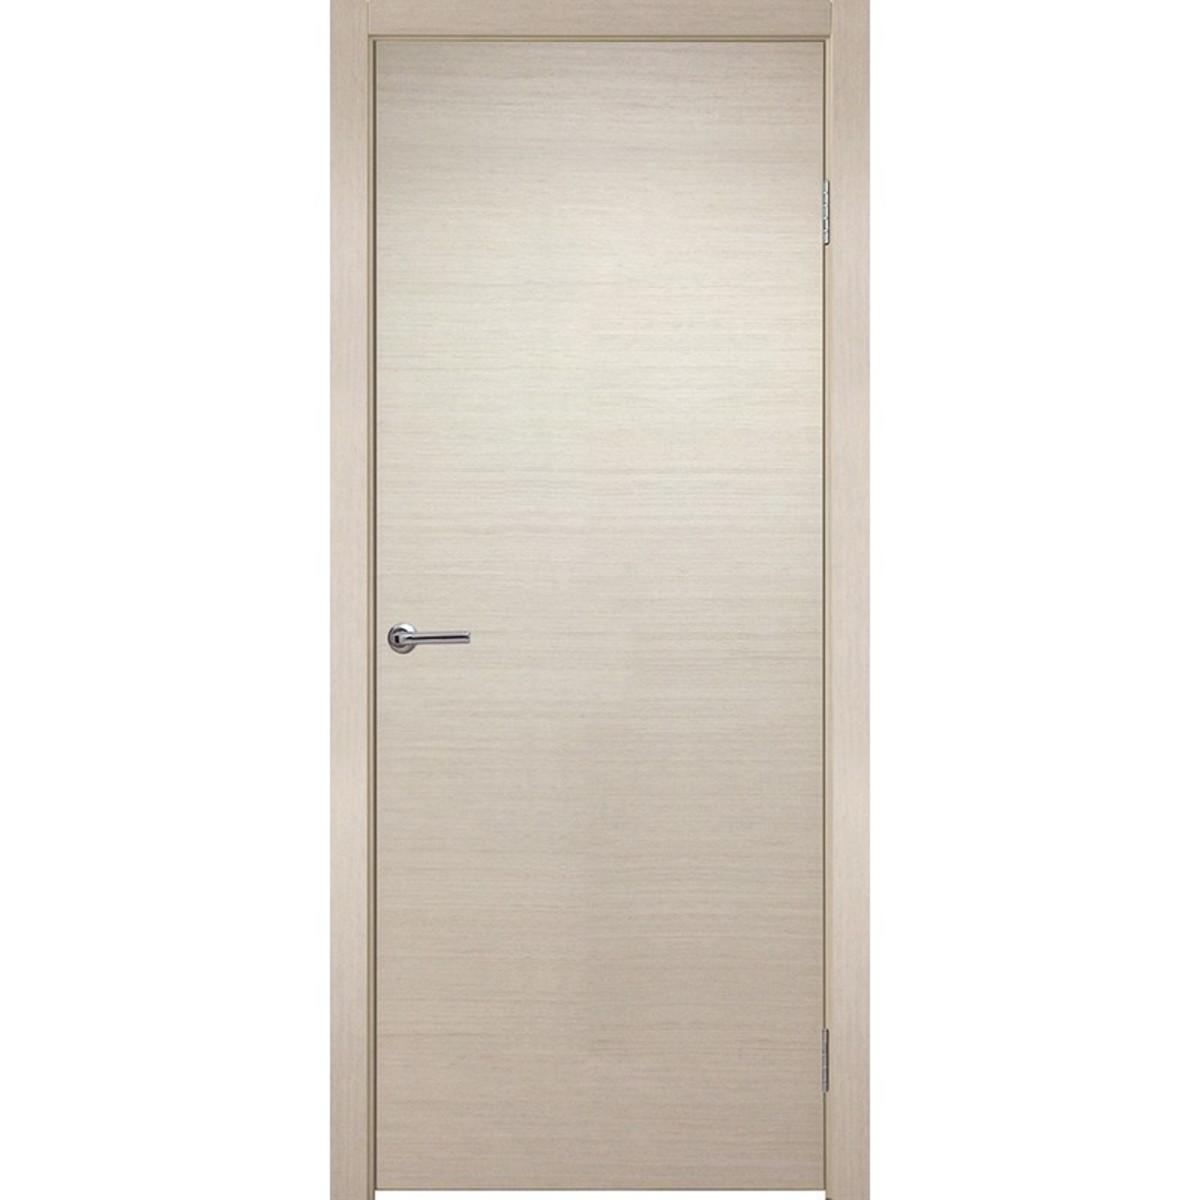 Дверь Межкомнатная Глухая Шарлотт 90x200 Шпон Цвет Дуб Белёный